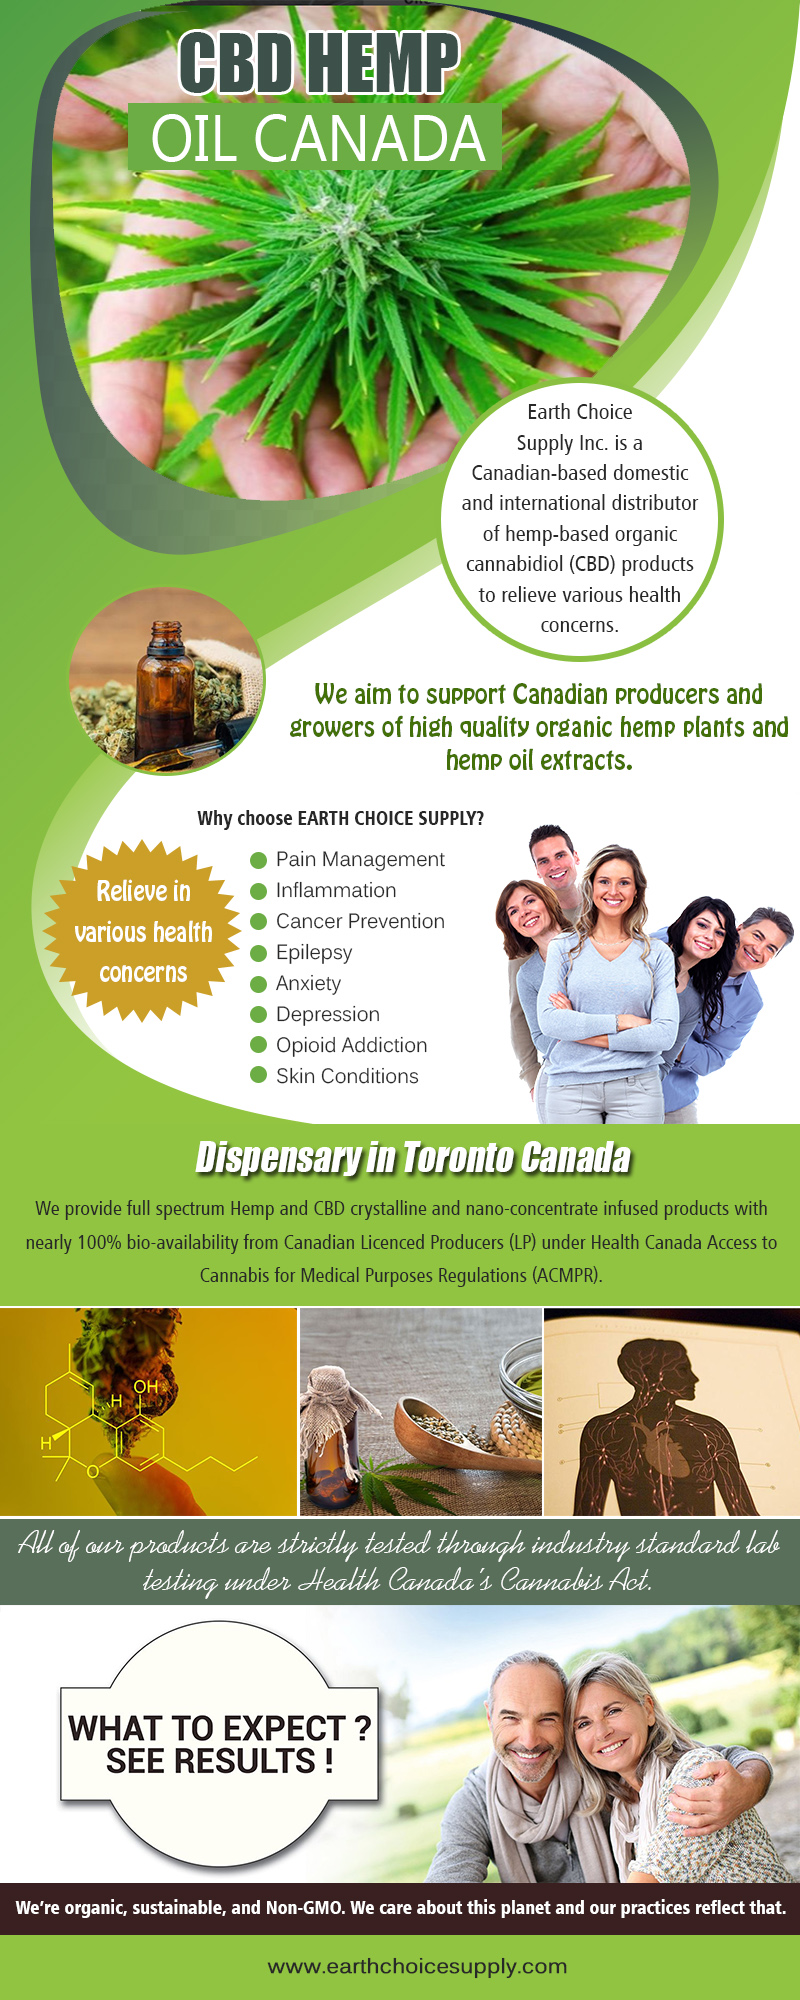 CBD Hemp Oil Toronto Canada | Call Us – 416-922-7238 | earthchoicesupply.com